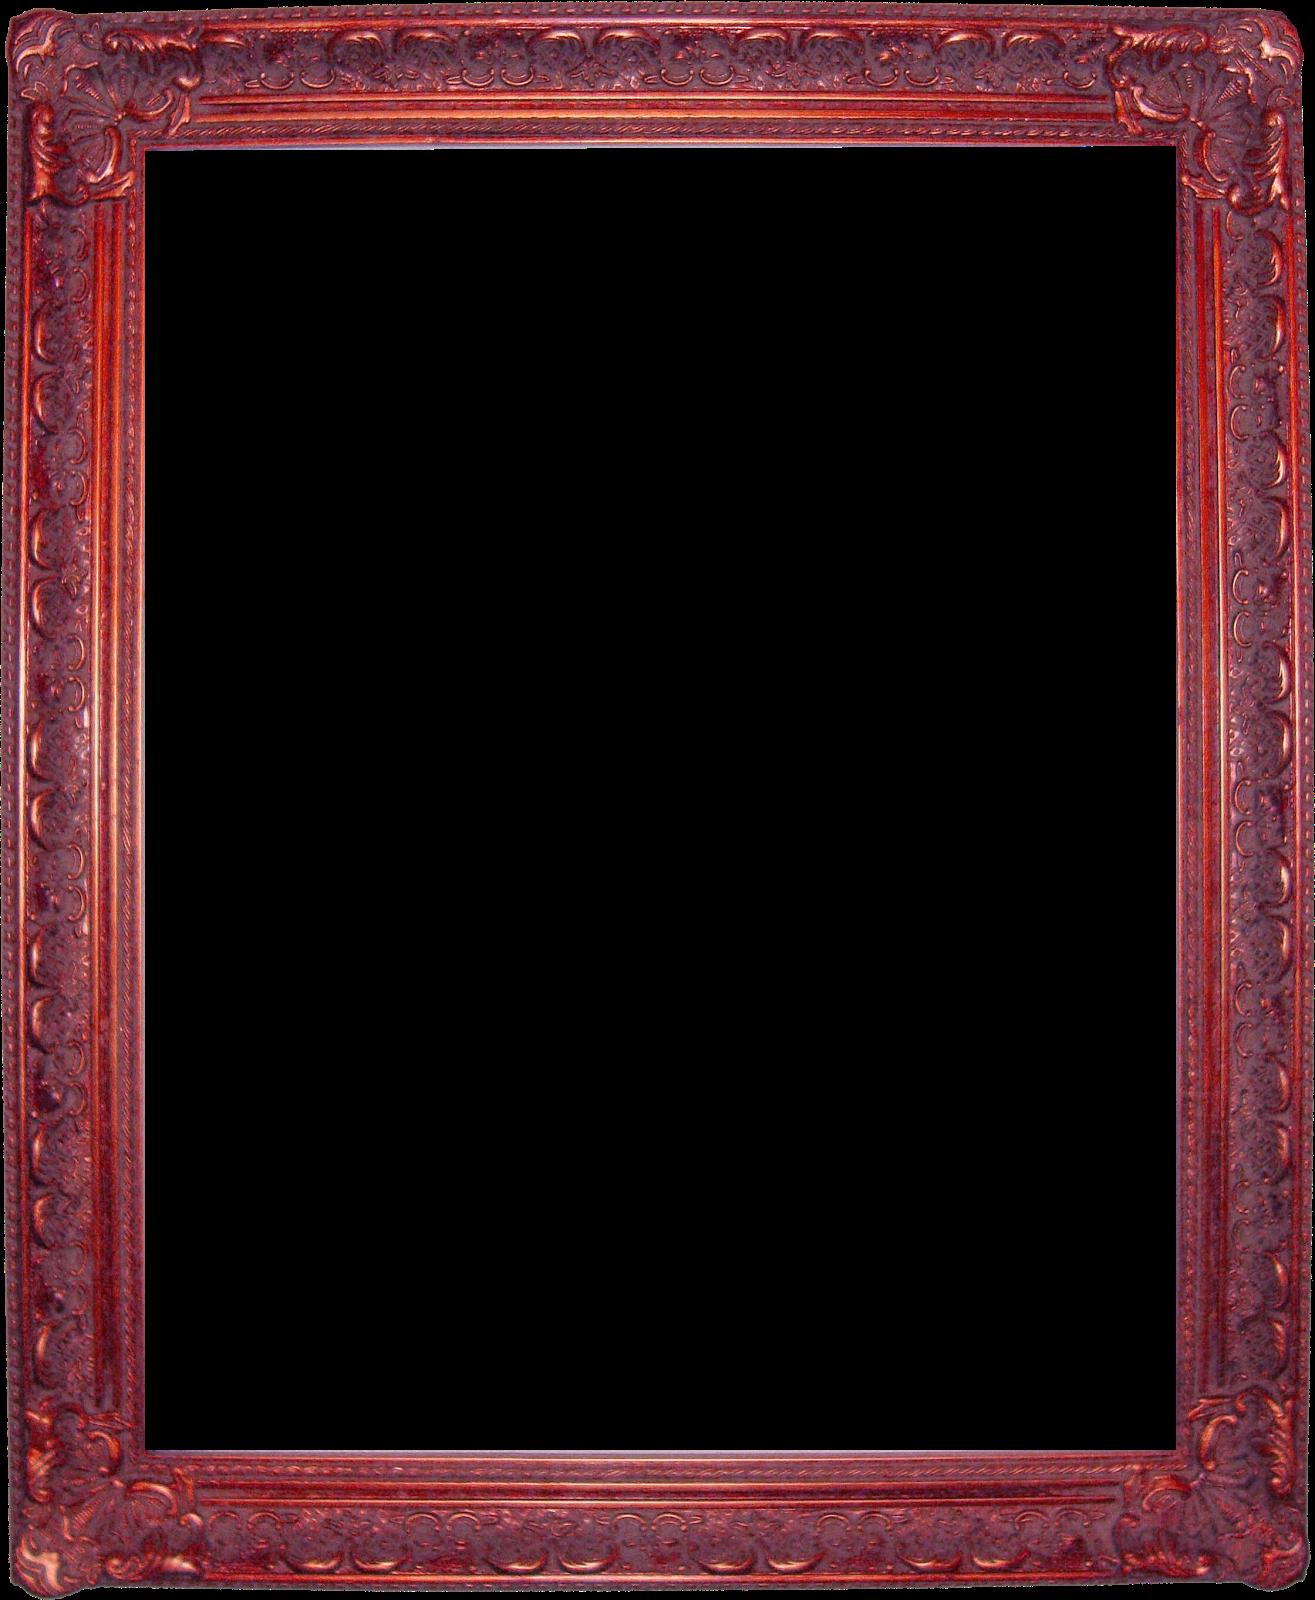 fancy frames png wwwpixsharkcom images galleries